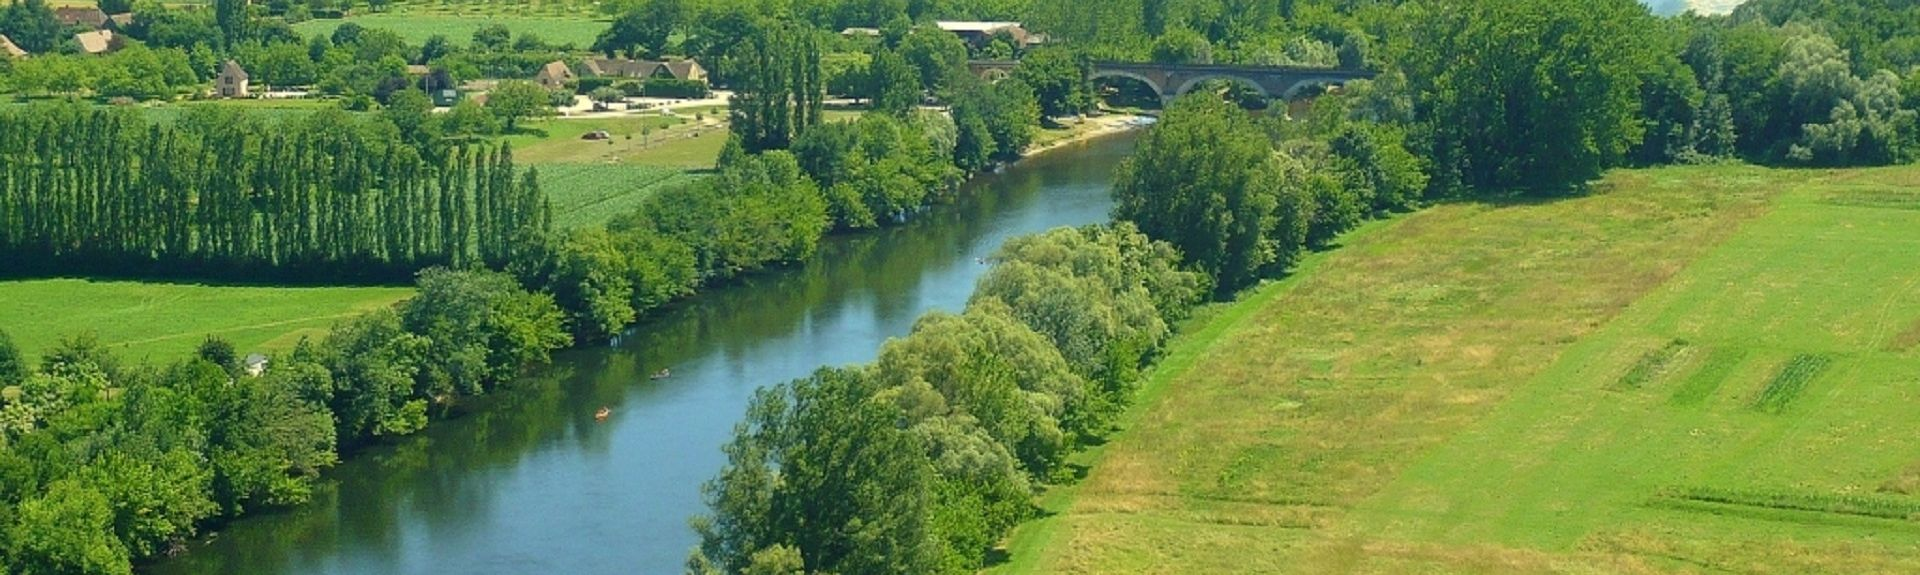 Saint-Genies, Dordogne, France